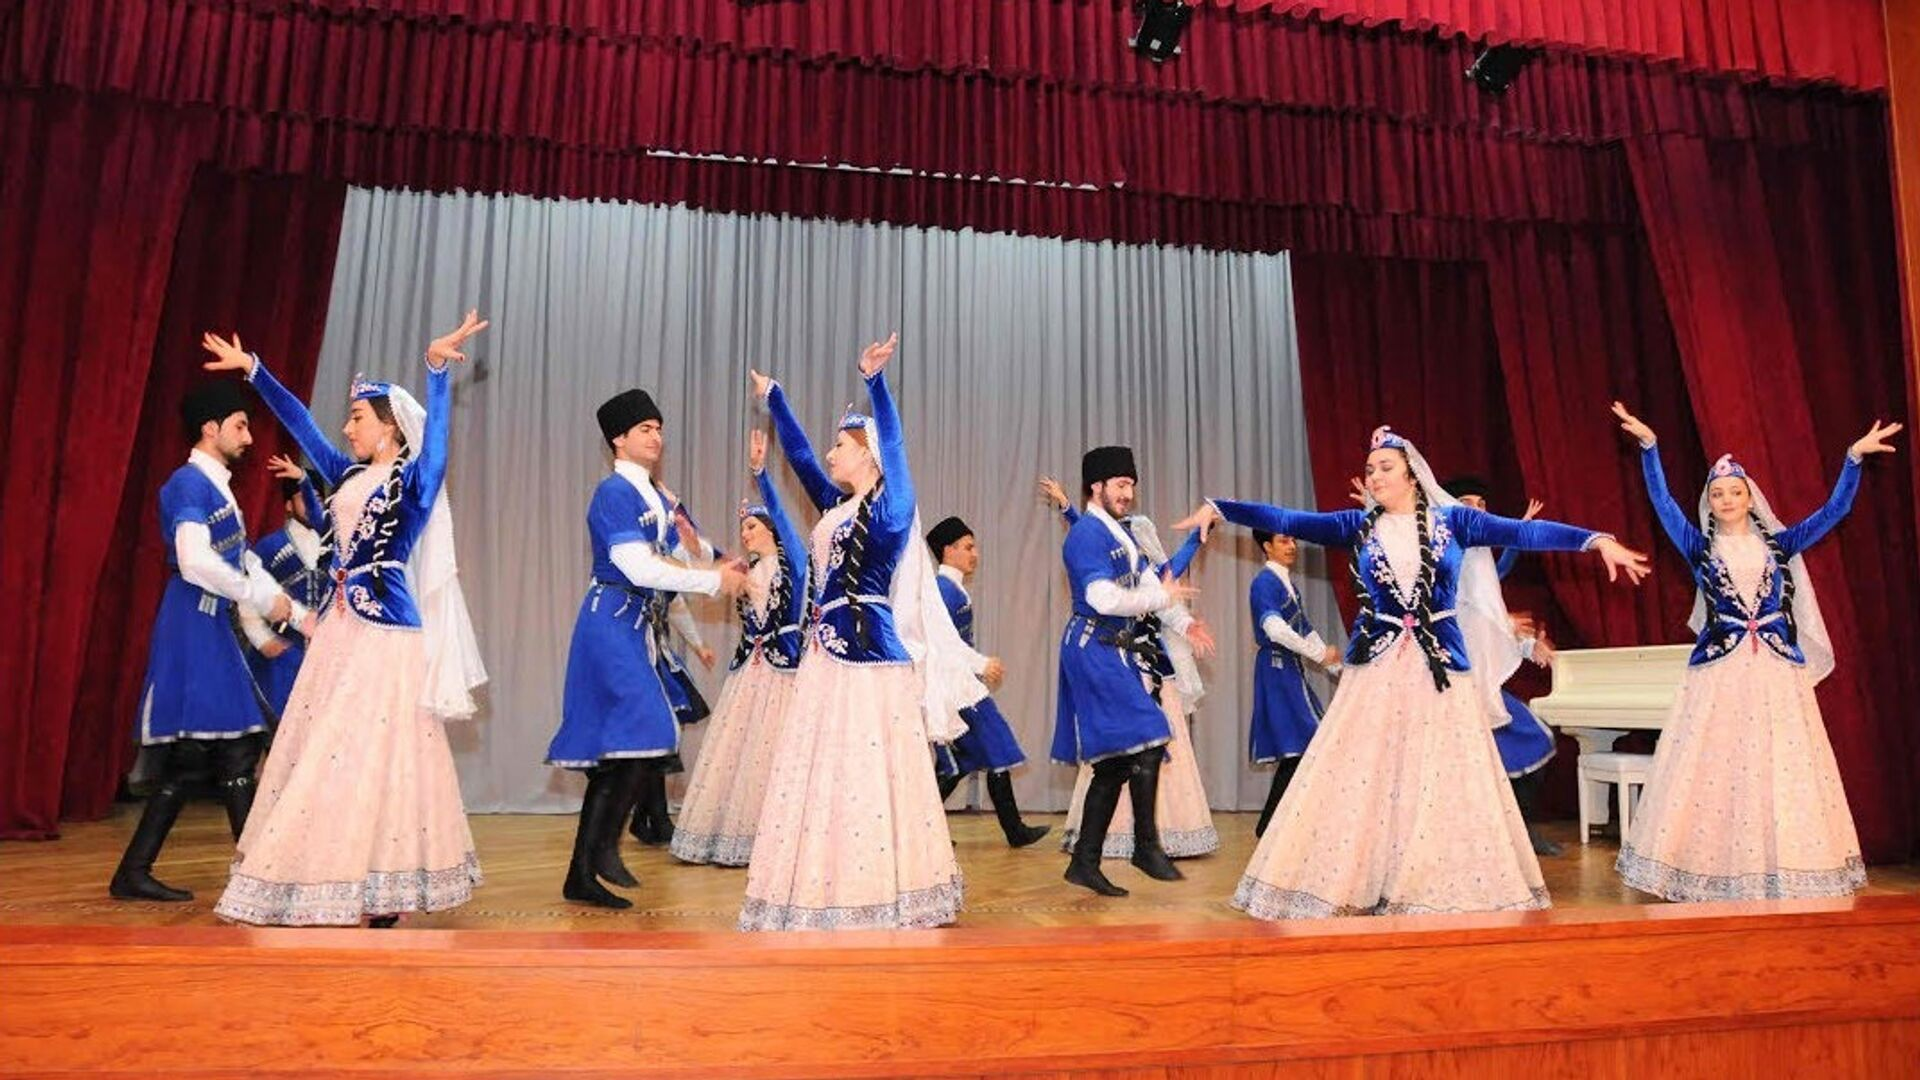 Национальные танцы Азербайджана  - Sputnik Azərbaycan, 1920, 06.09.2021